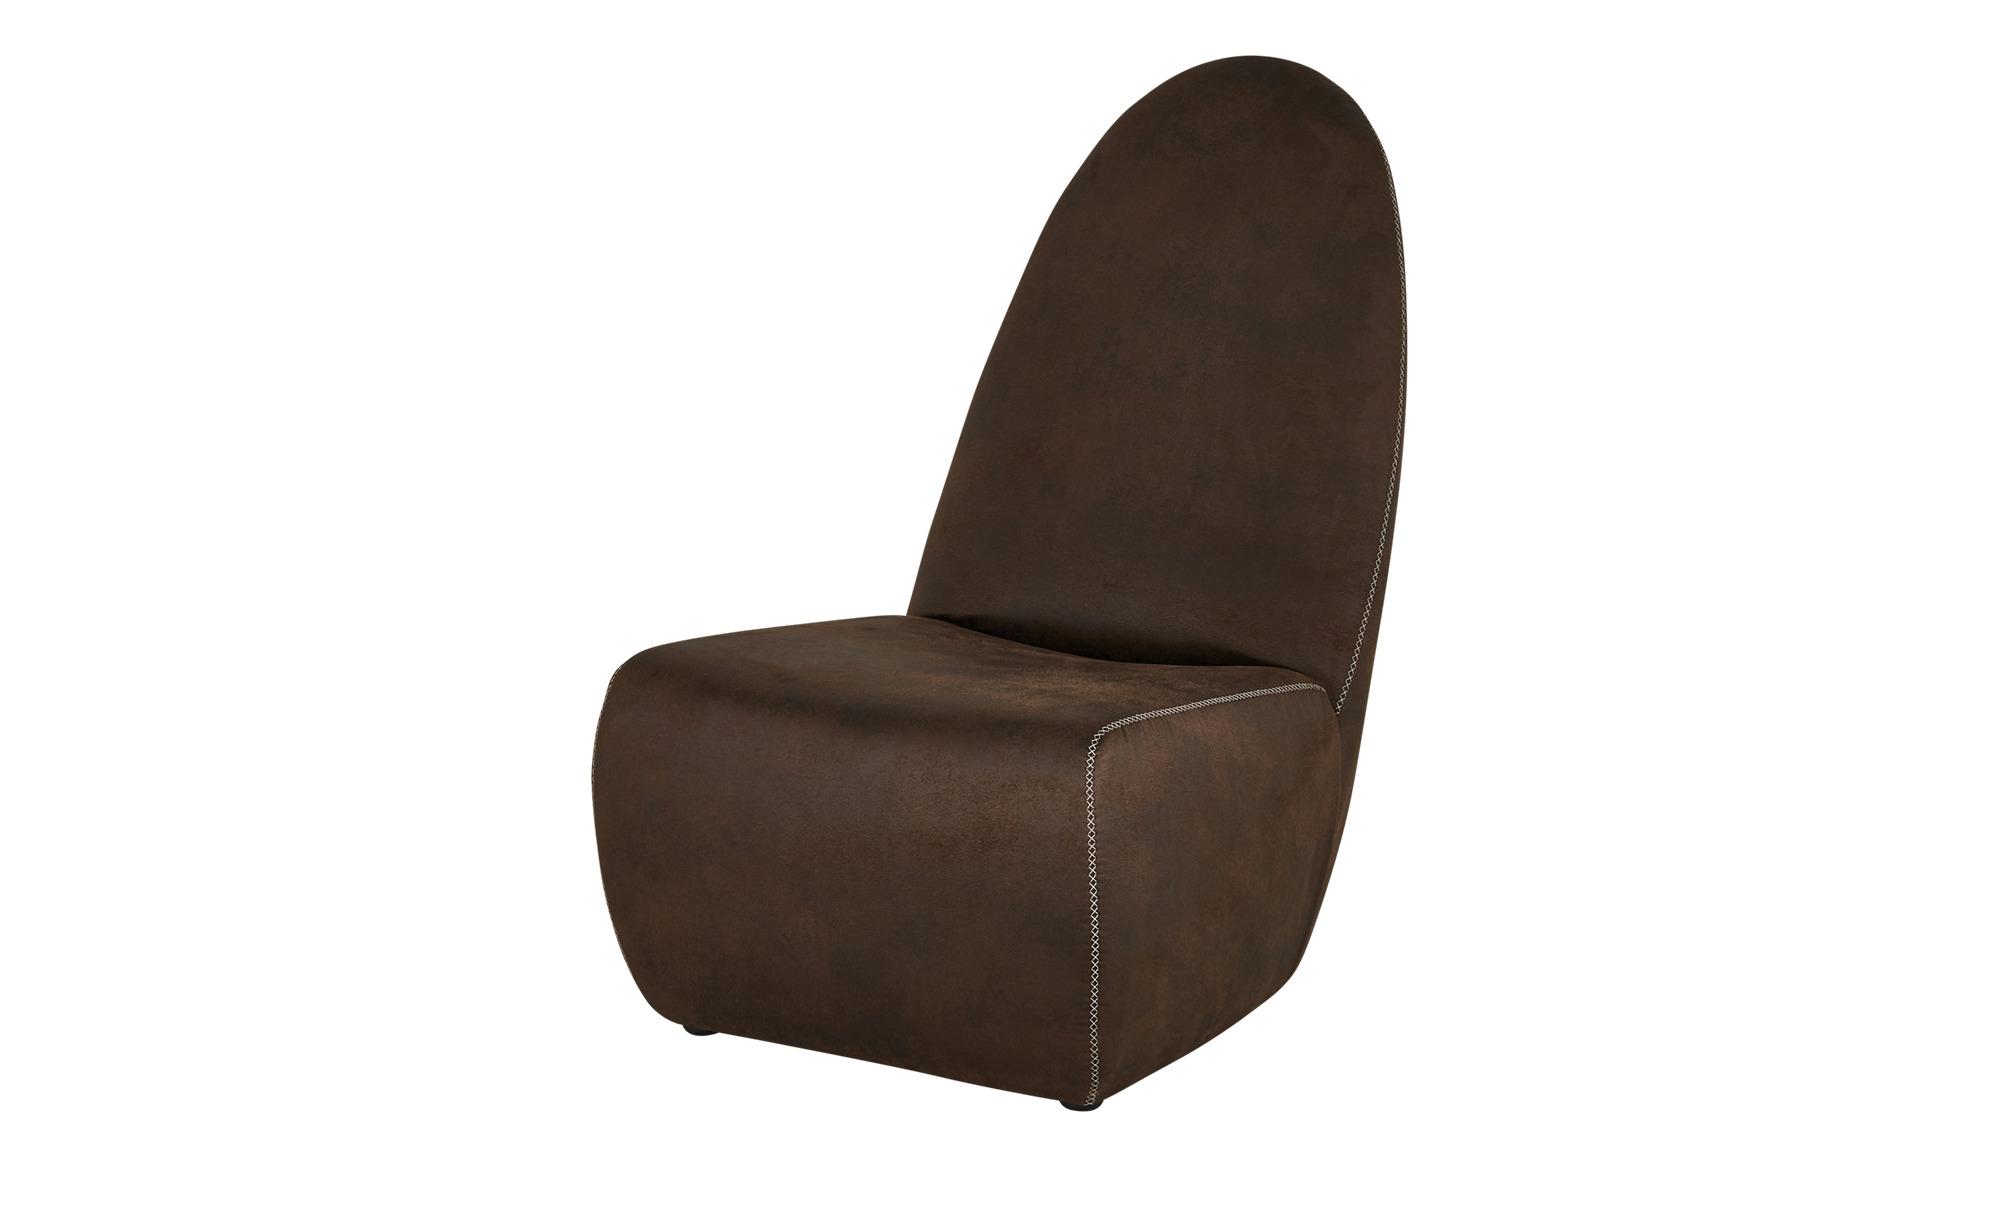 Sessel  Sarah ¦ braun ¦ Maße (cm): B: 65 H: 93 T: 90 Polstermöbel > Sessel > Polstersessel - Höffner